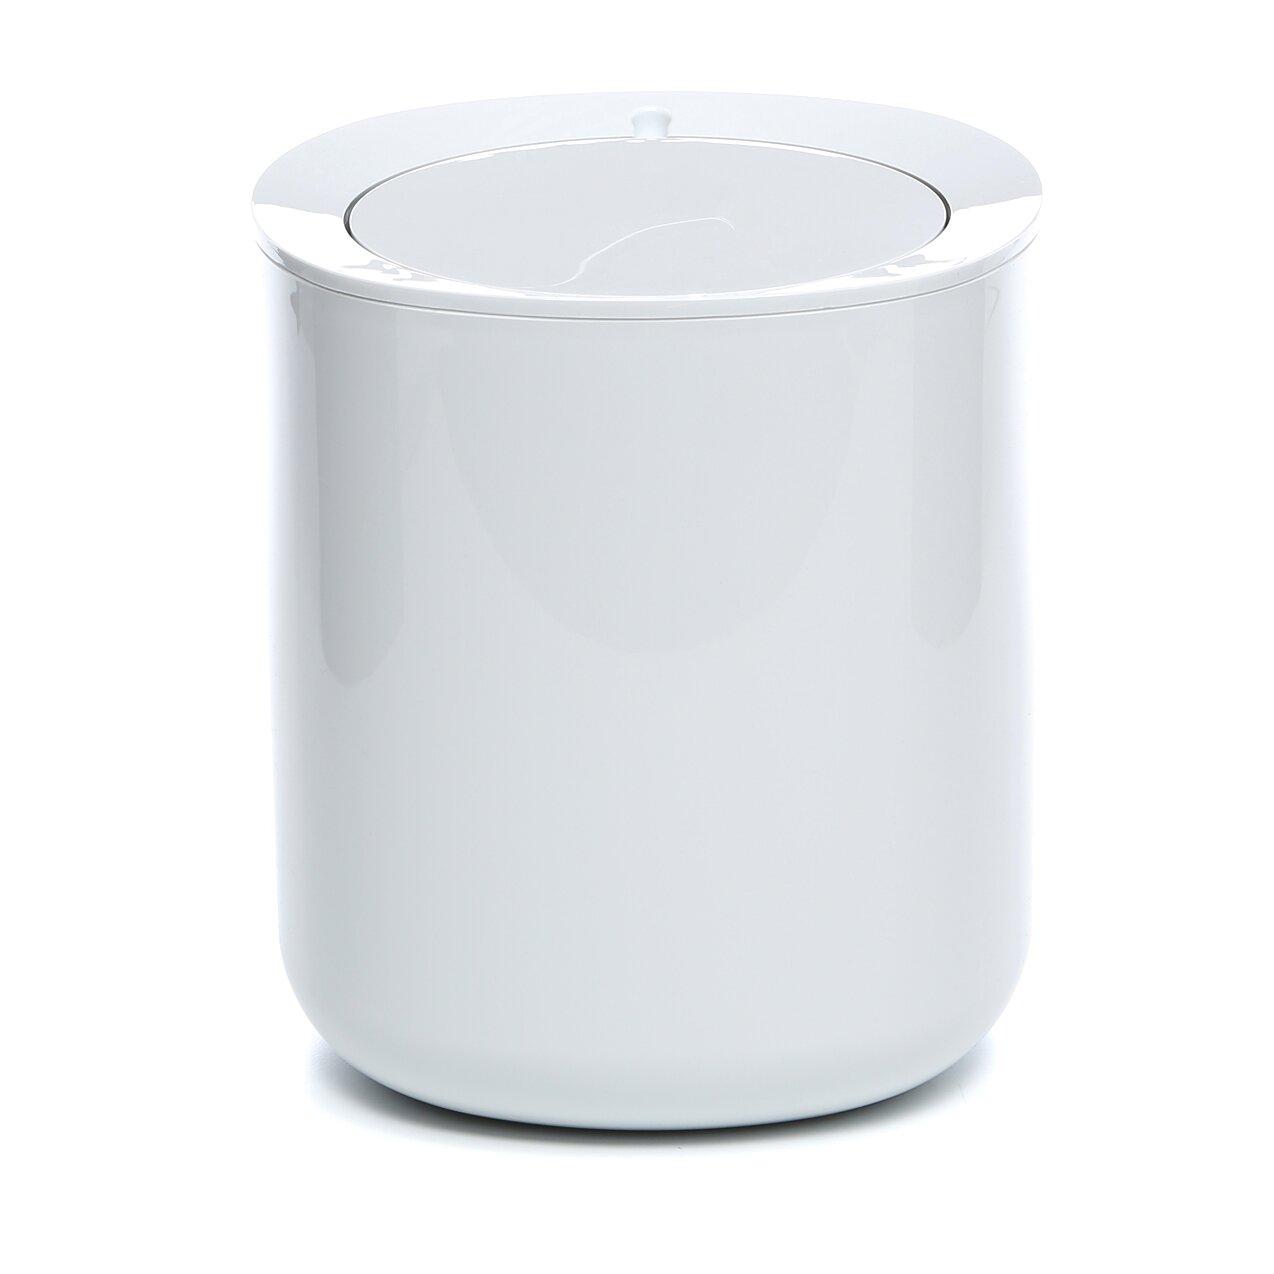 birillo bathroom 1 gallon swing top trash can reviews allmodern. Black Bedroom Furniture Sets. Home Design Ideas